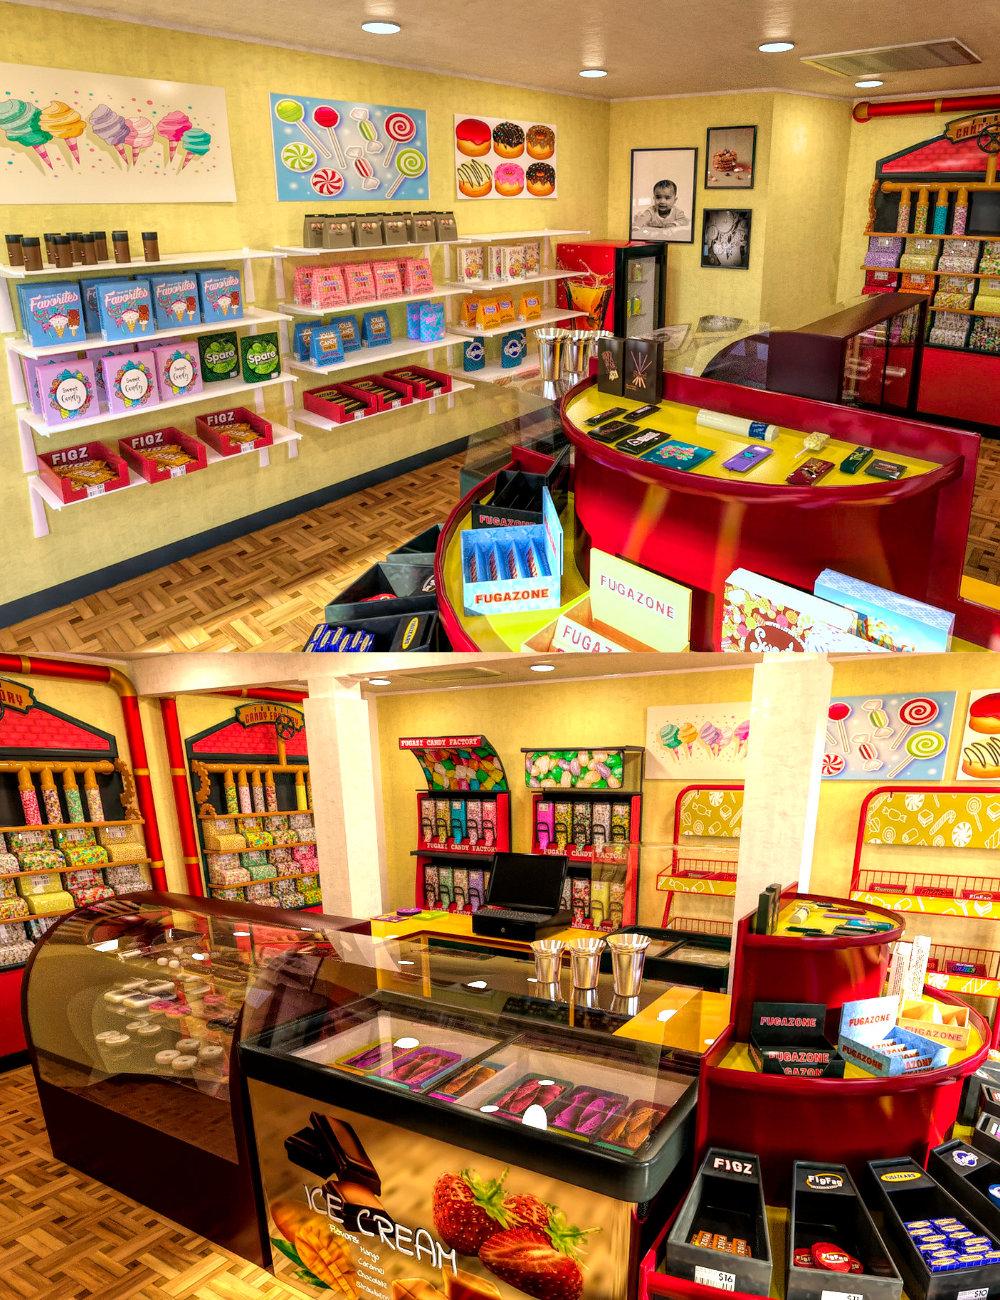 FG Candy Store by: Fugazi1968PAN StudiosIronman, 3D Models by Daz 3D